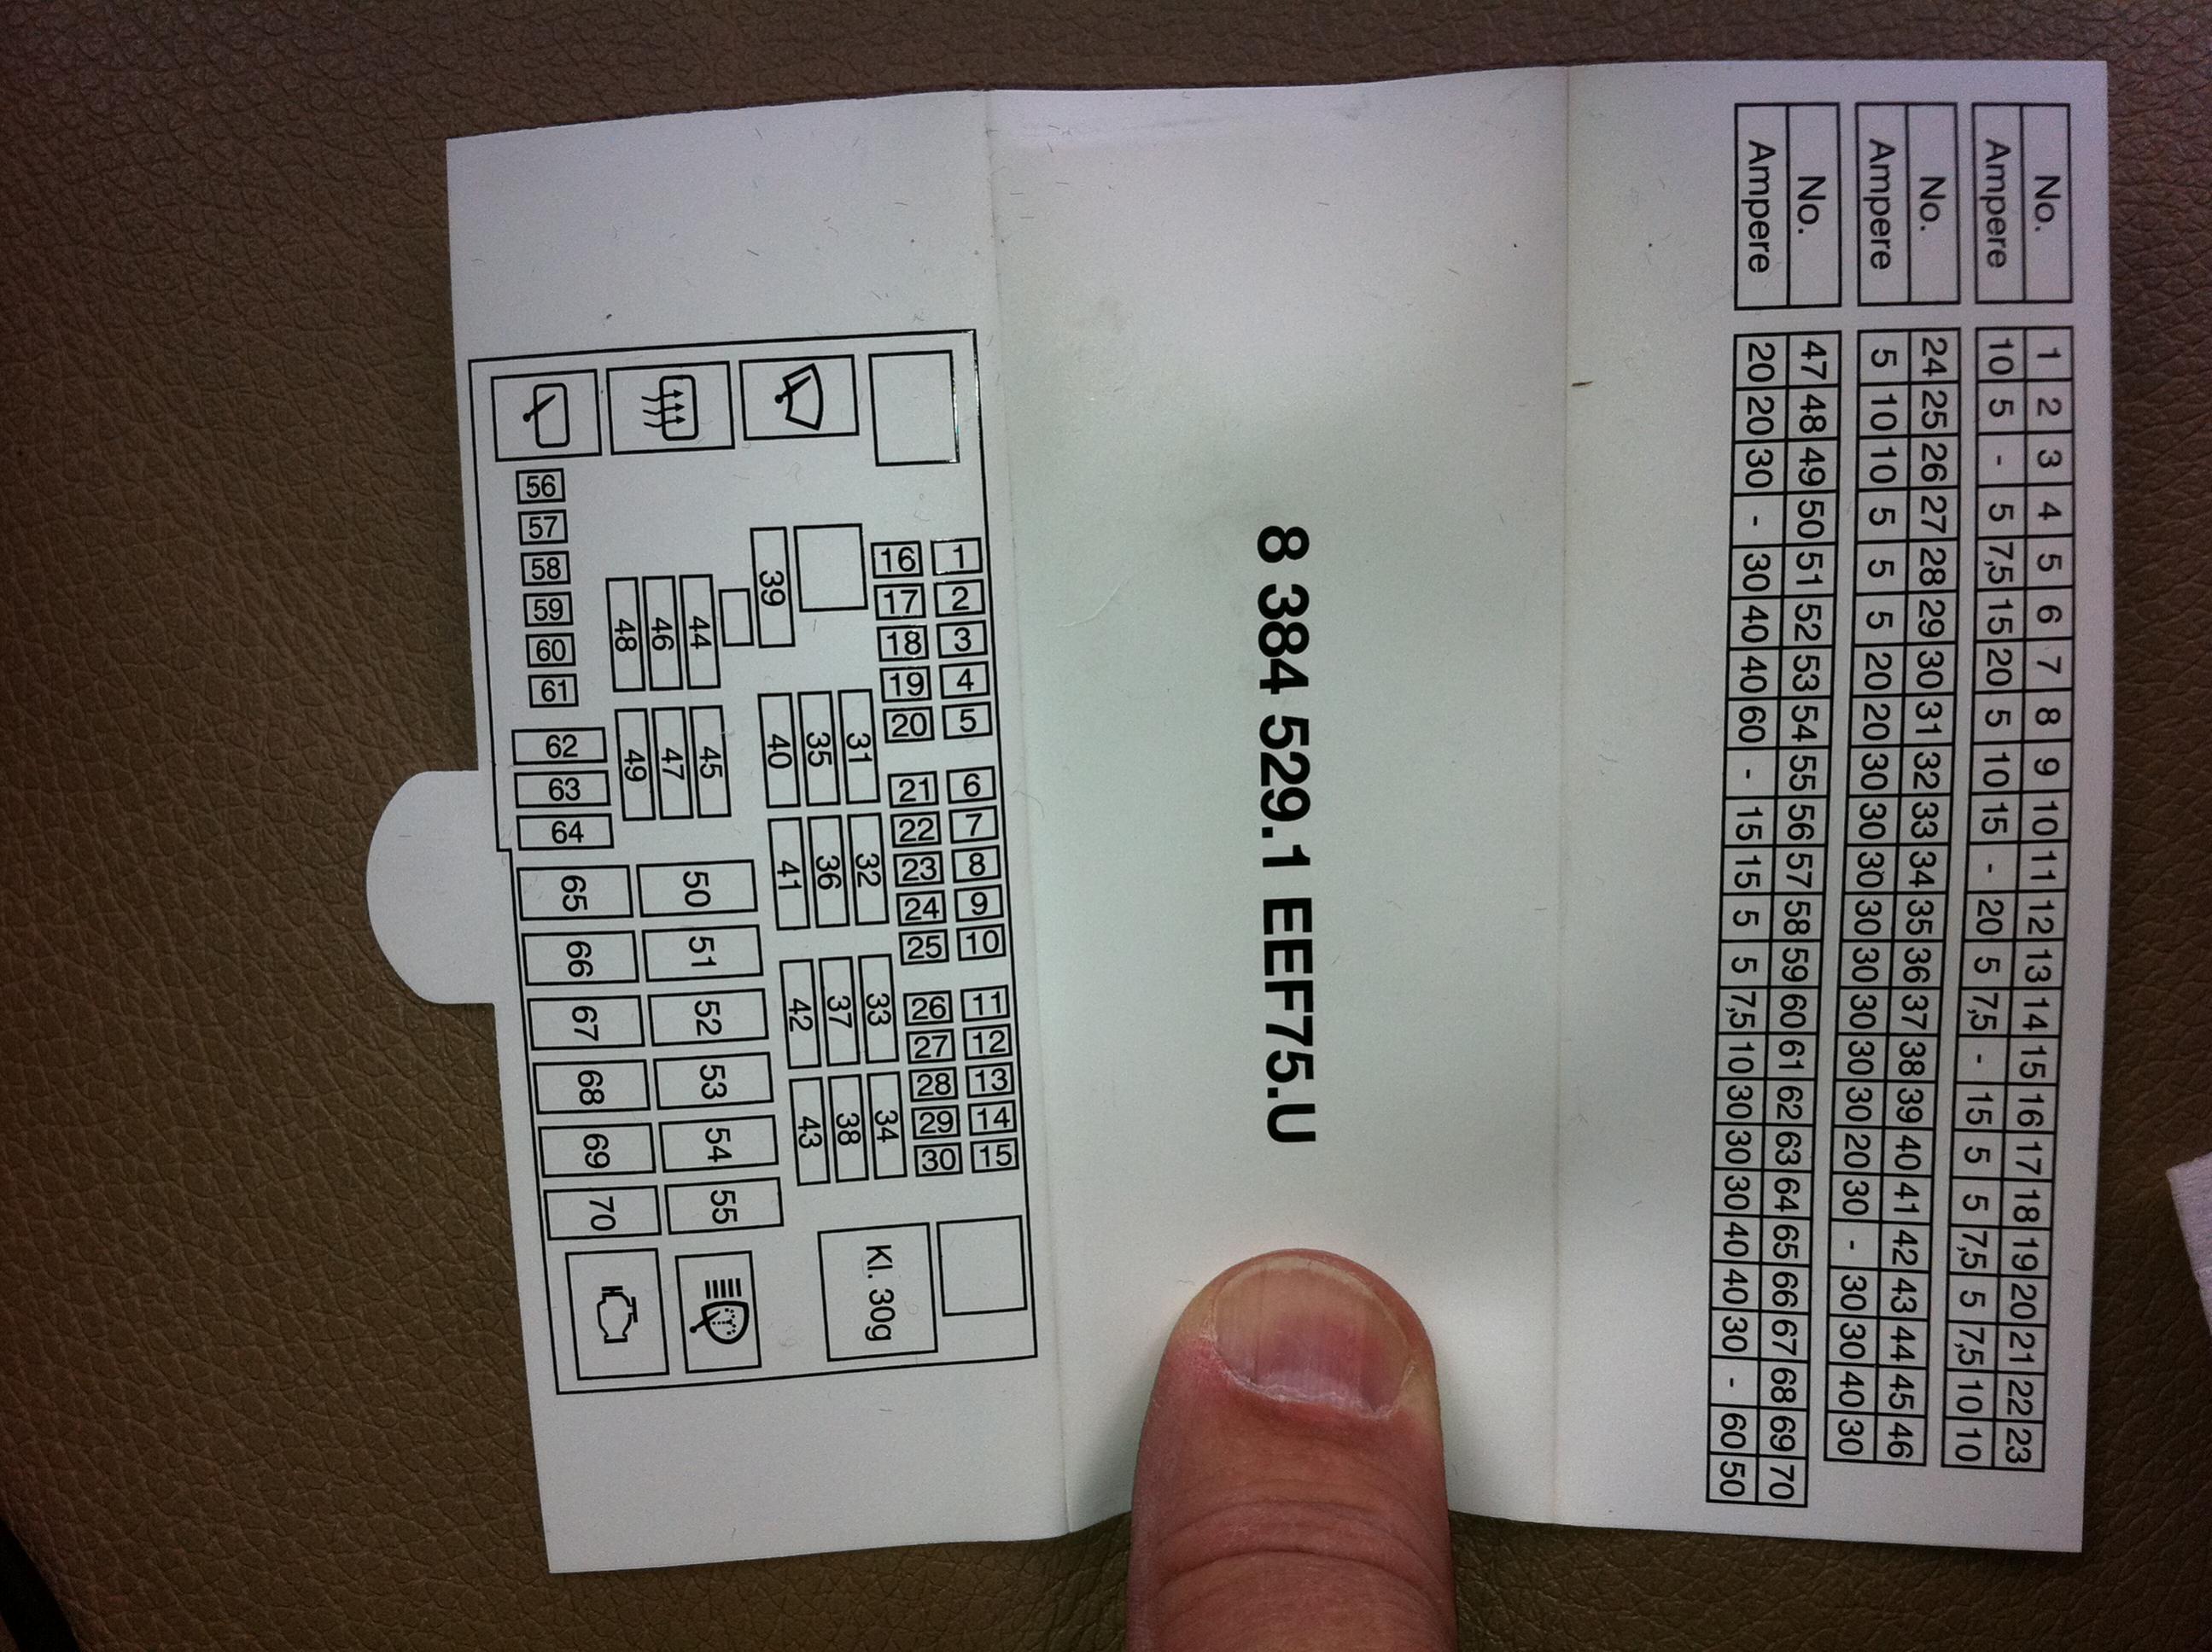 Bmw Fuse Box Diagram Wiring Harness Wiring Diagram Wiring Besides Bmw